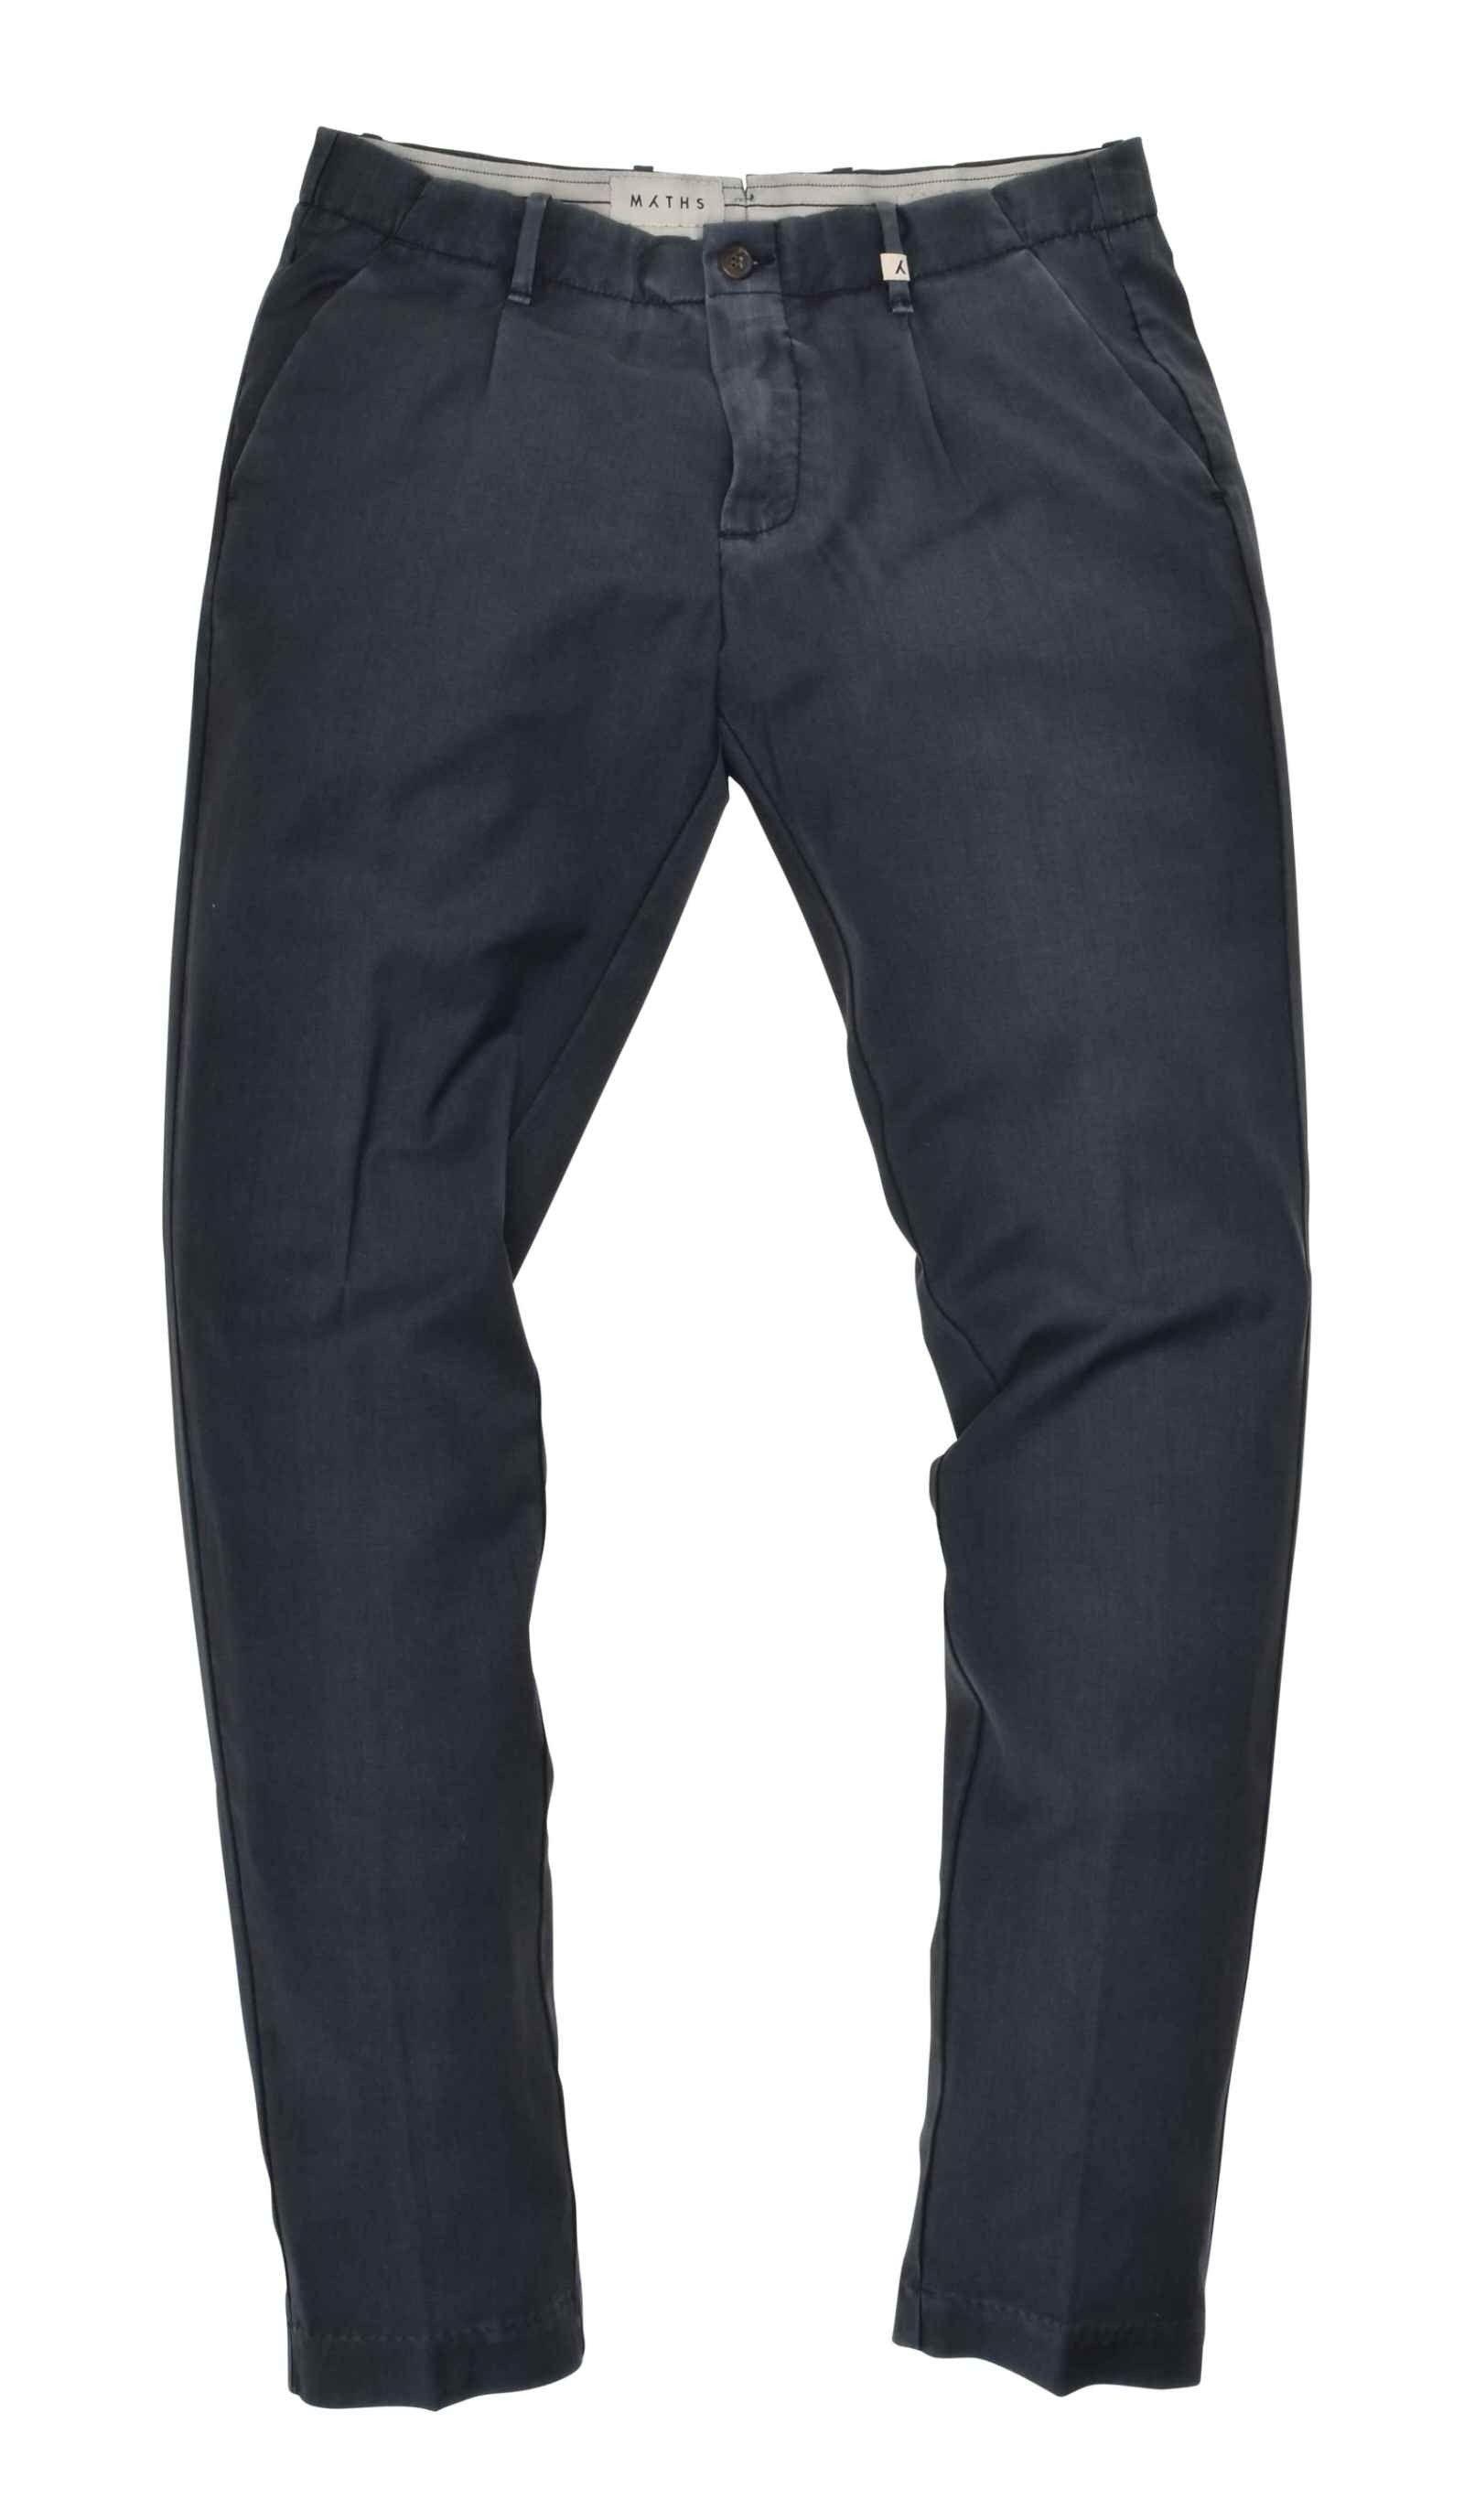 MYTHS - Herren Hose - Long Trousers - Blu